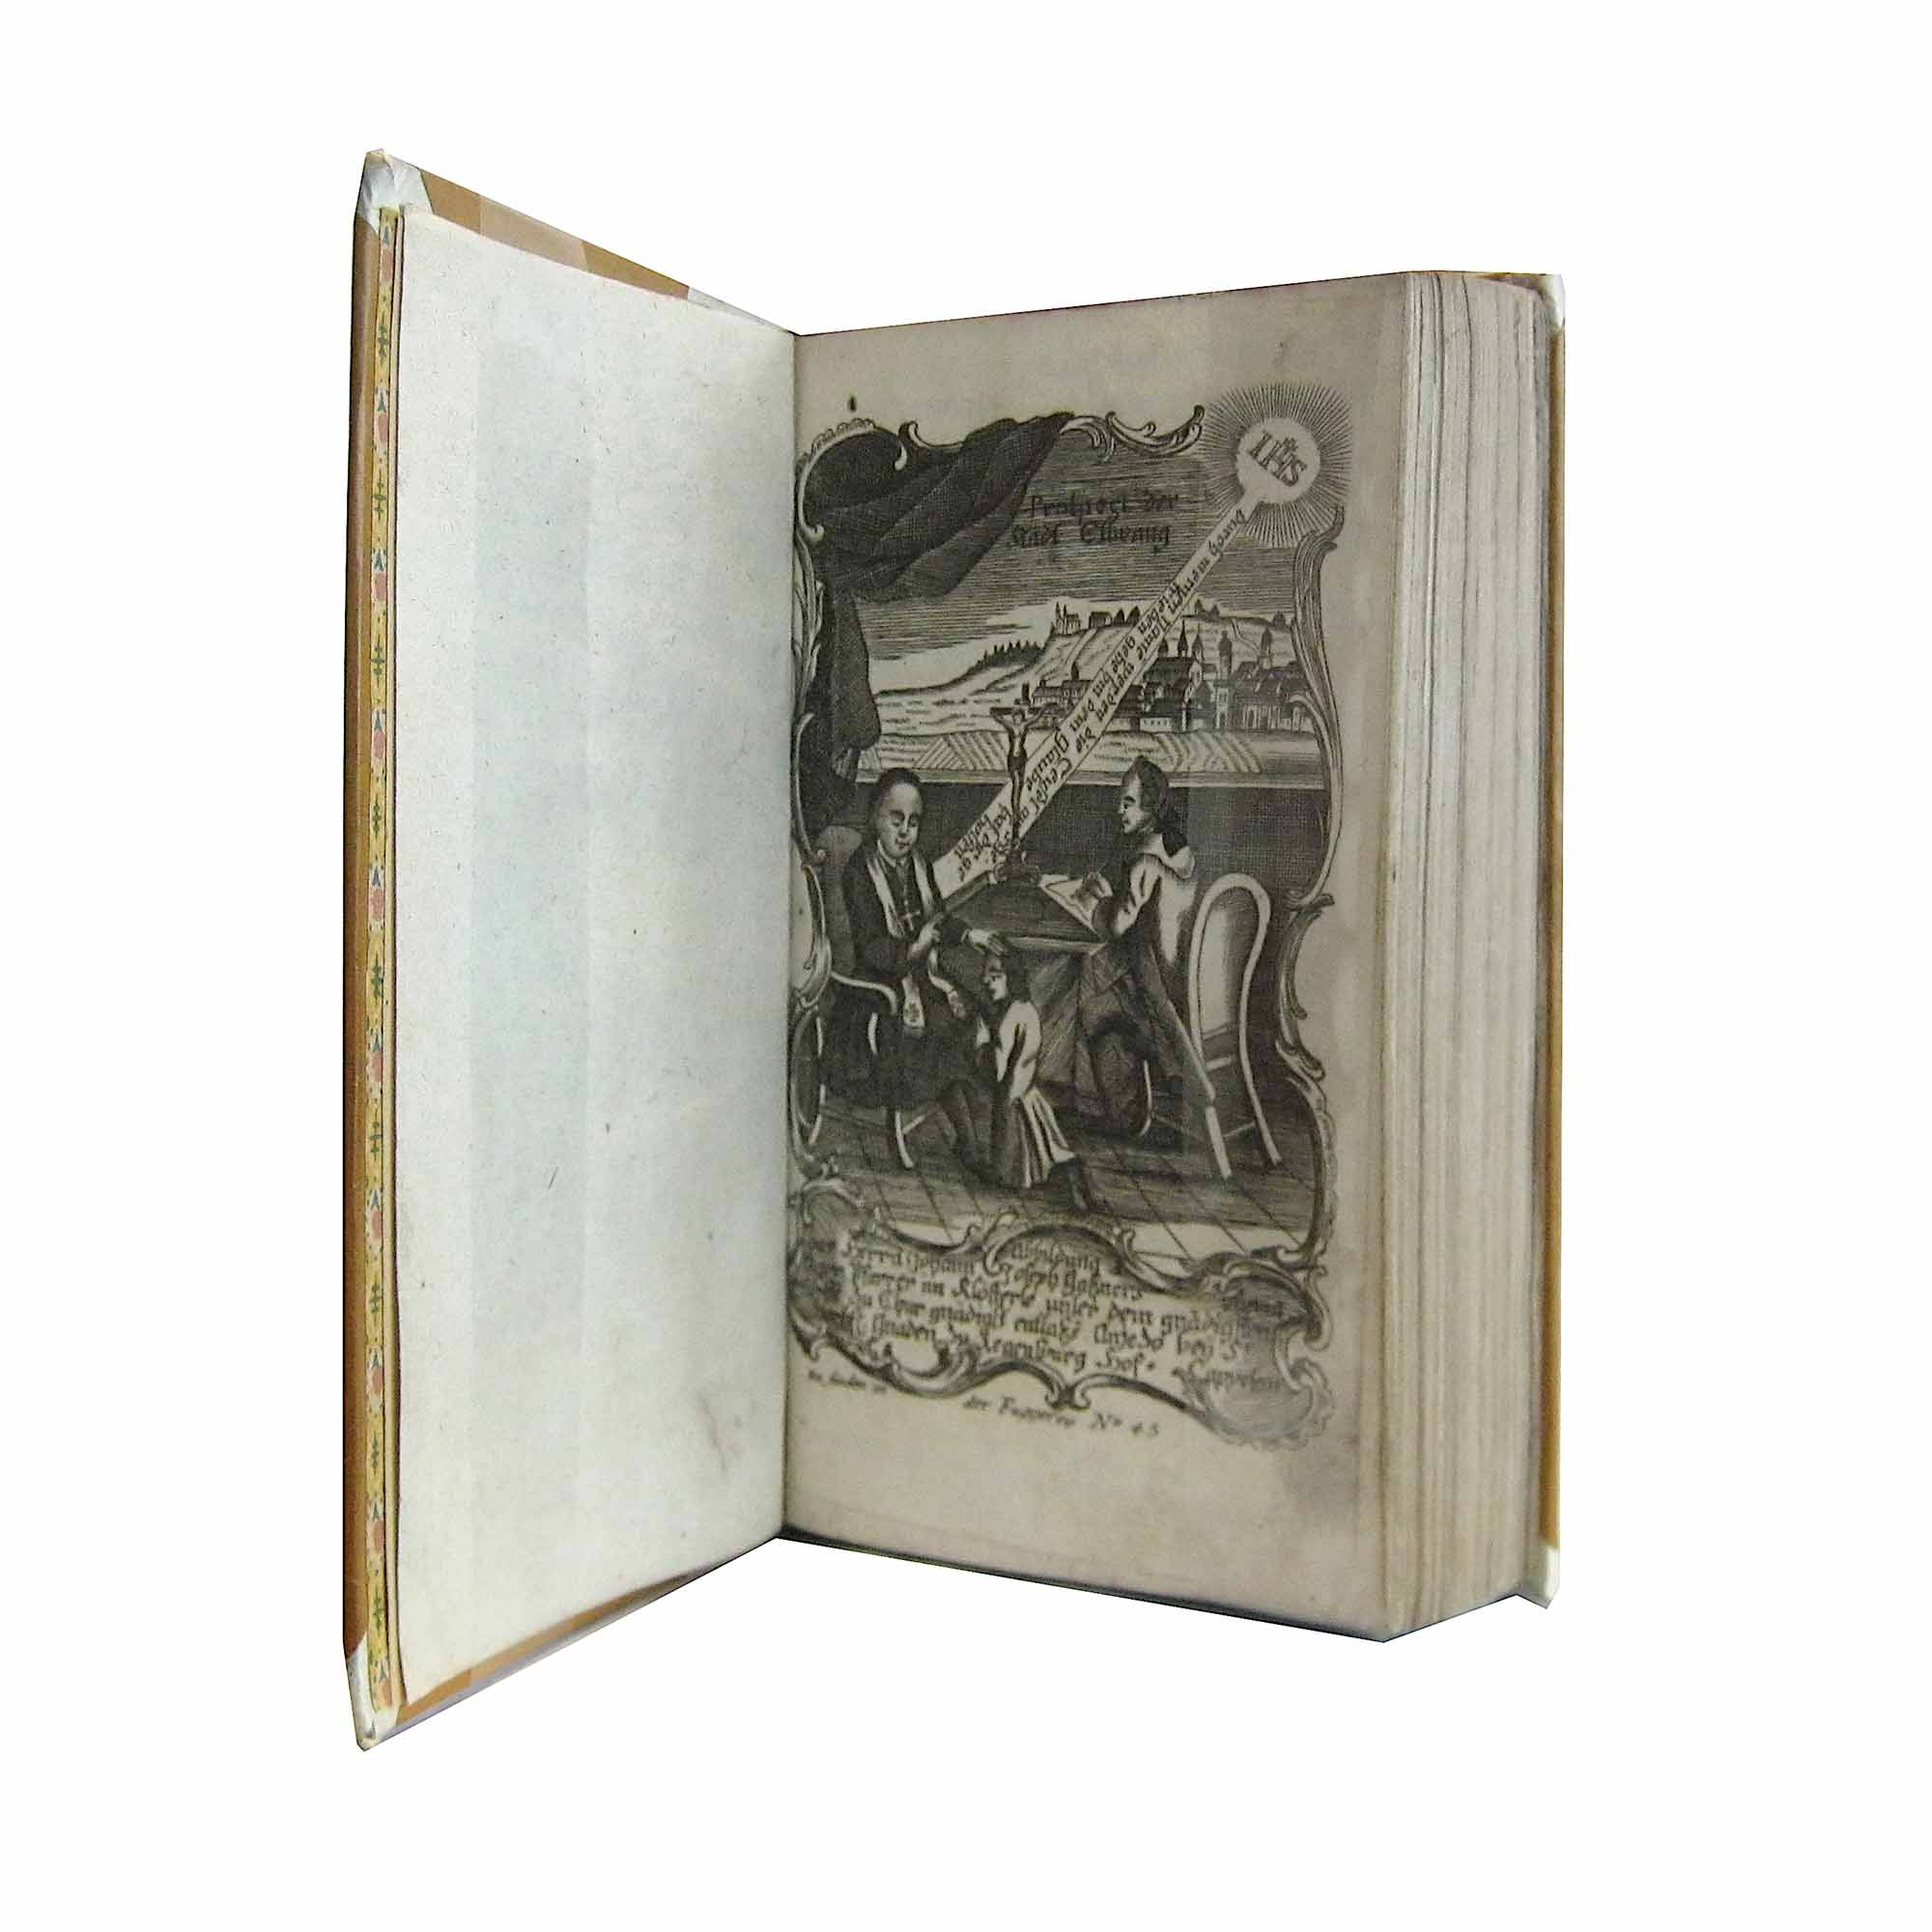 5410-Sammelband-Gassner-Exorzismus-1775-Frontispiz-frei-N.jpg